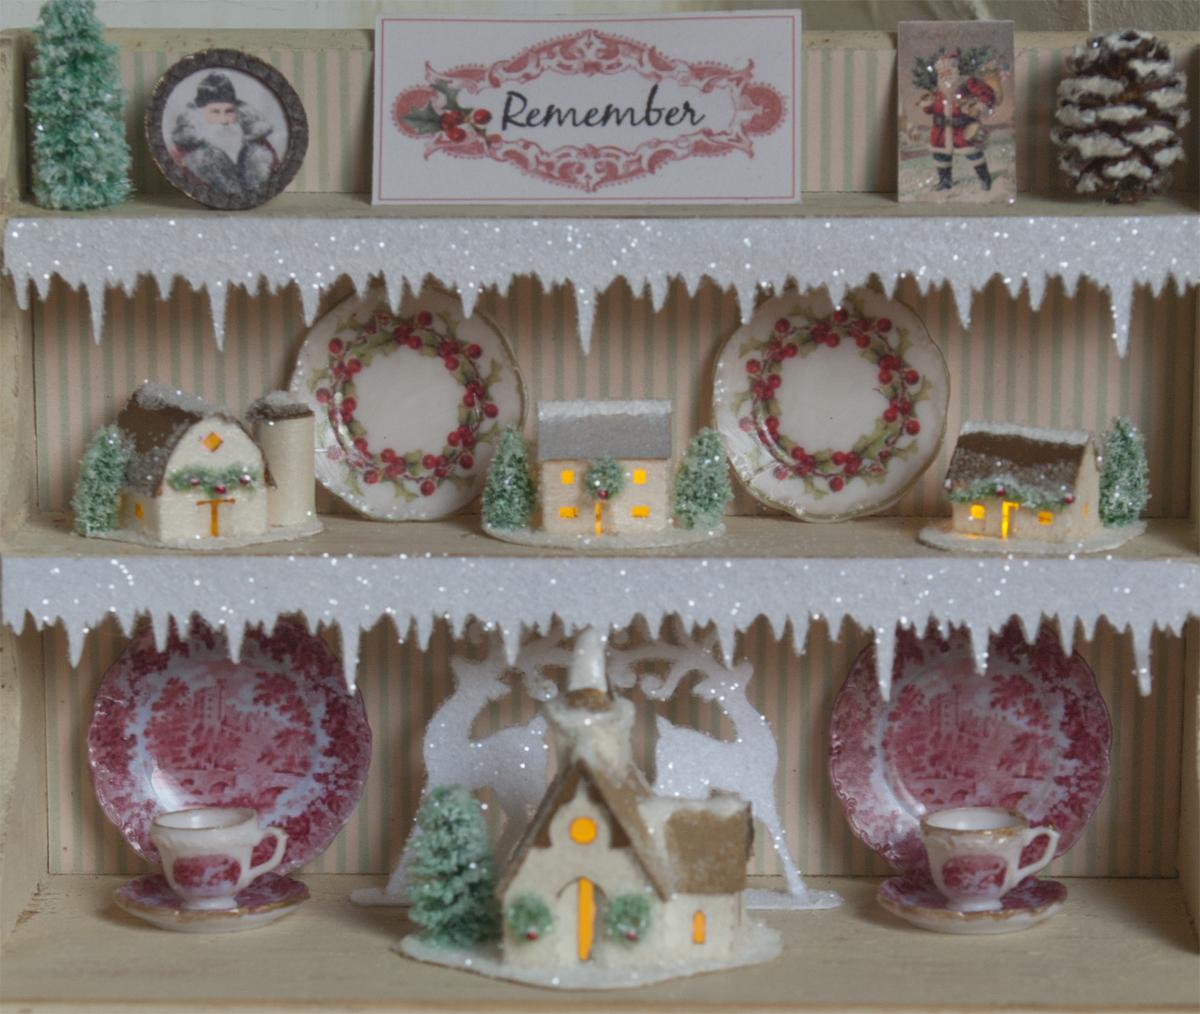 Dollhouse Miniatures Tutorials: True2scale: February 2012